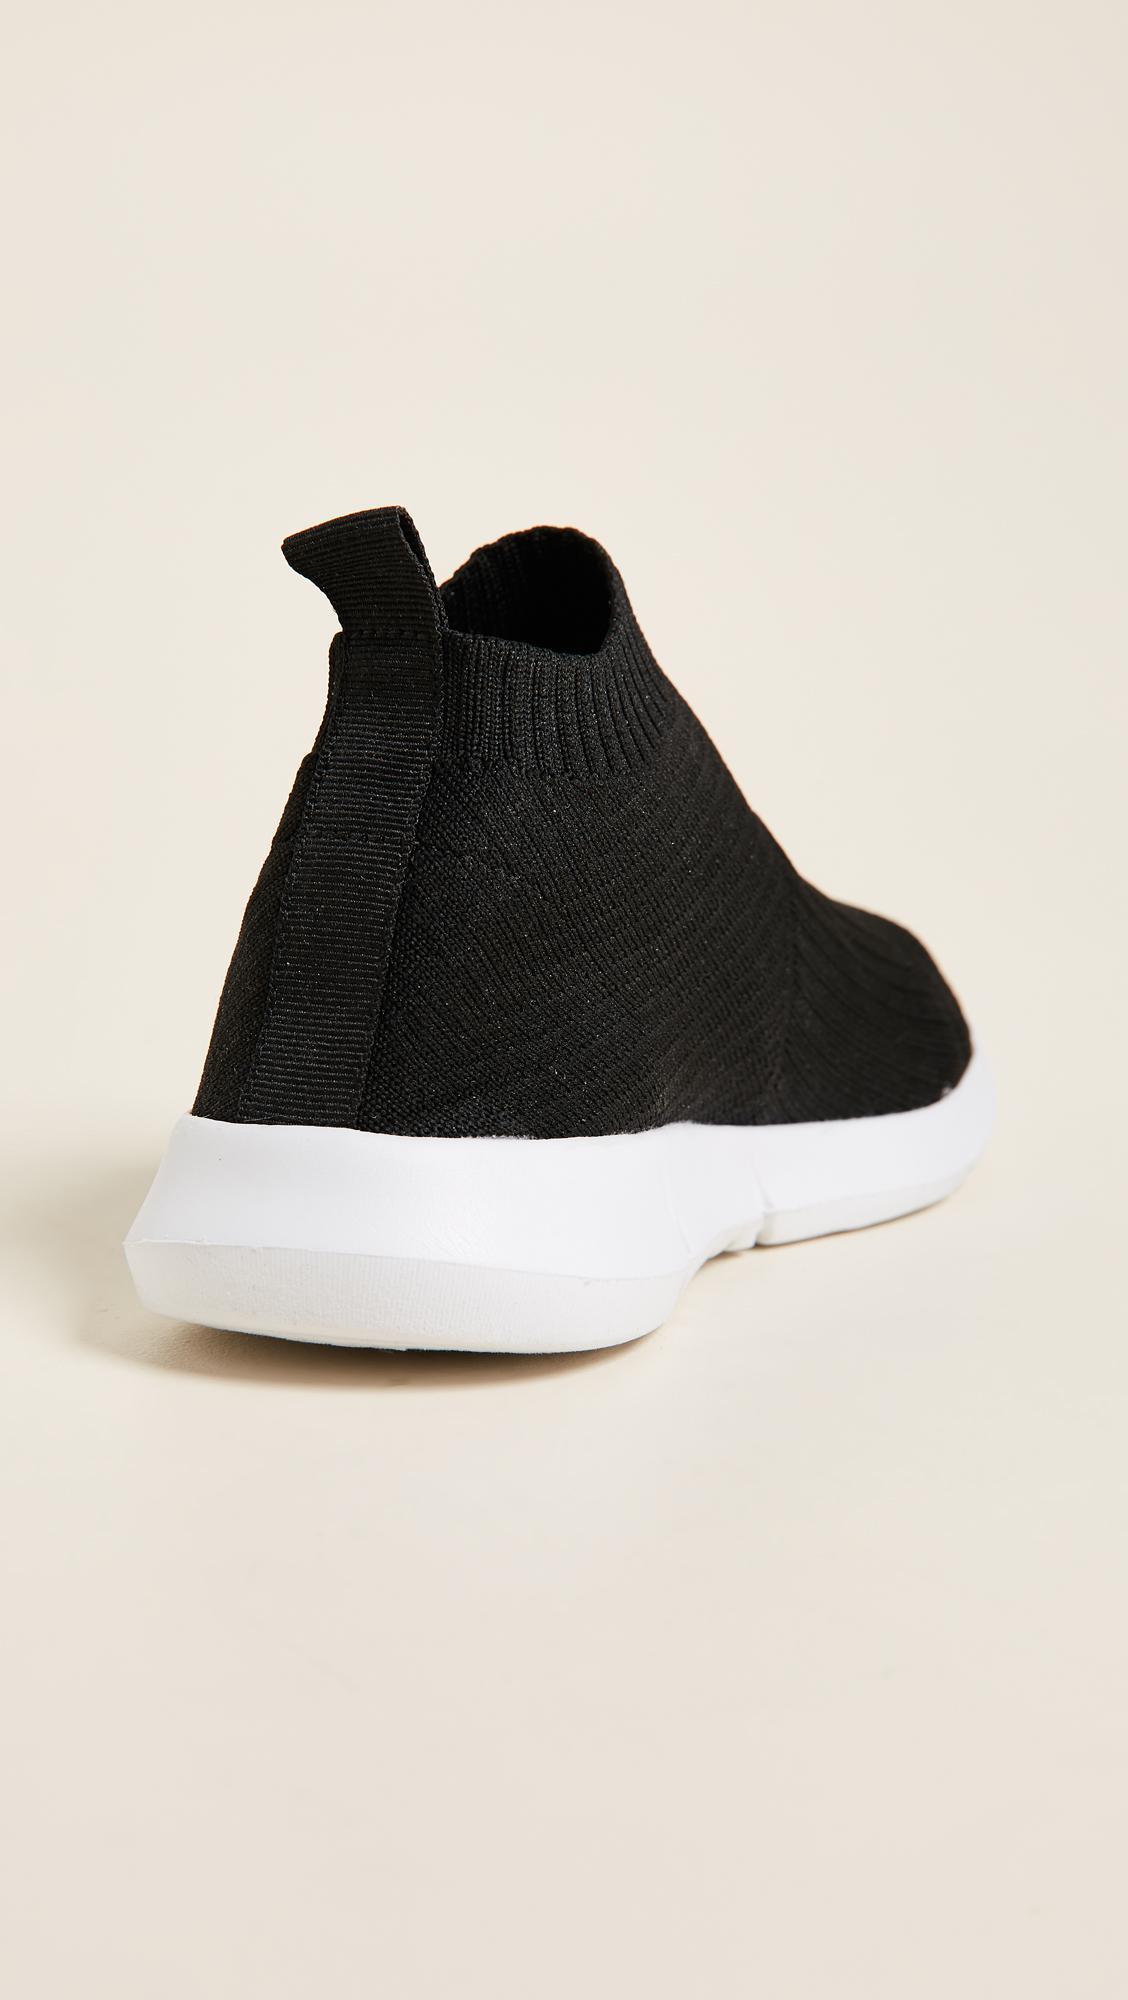 Steven by Steve Madden Fabs Knit Jogger Sneakers in Black